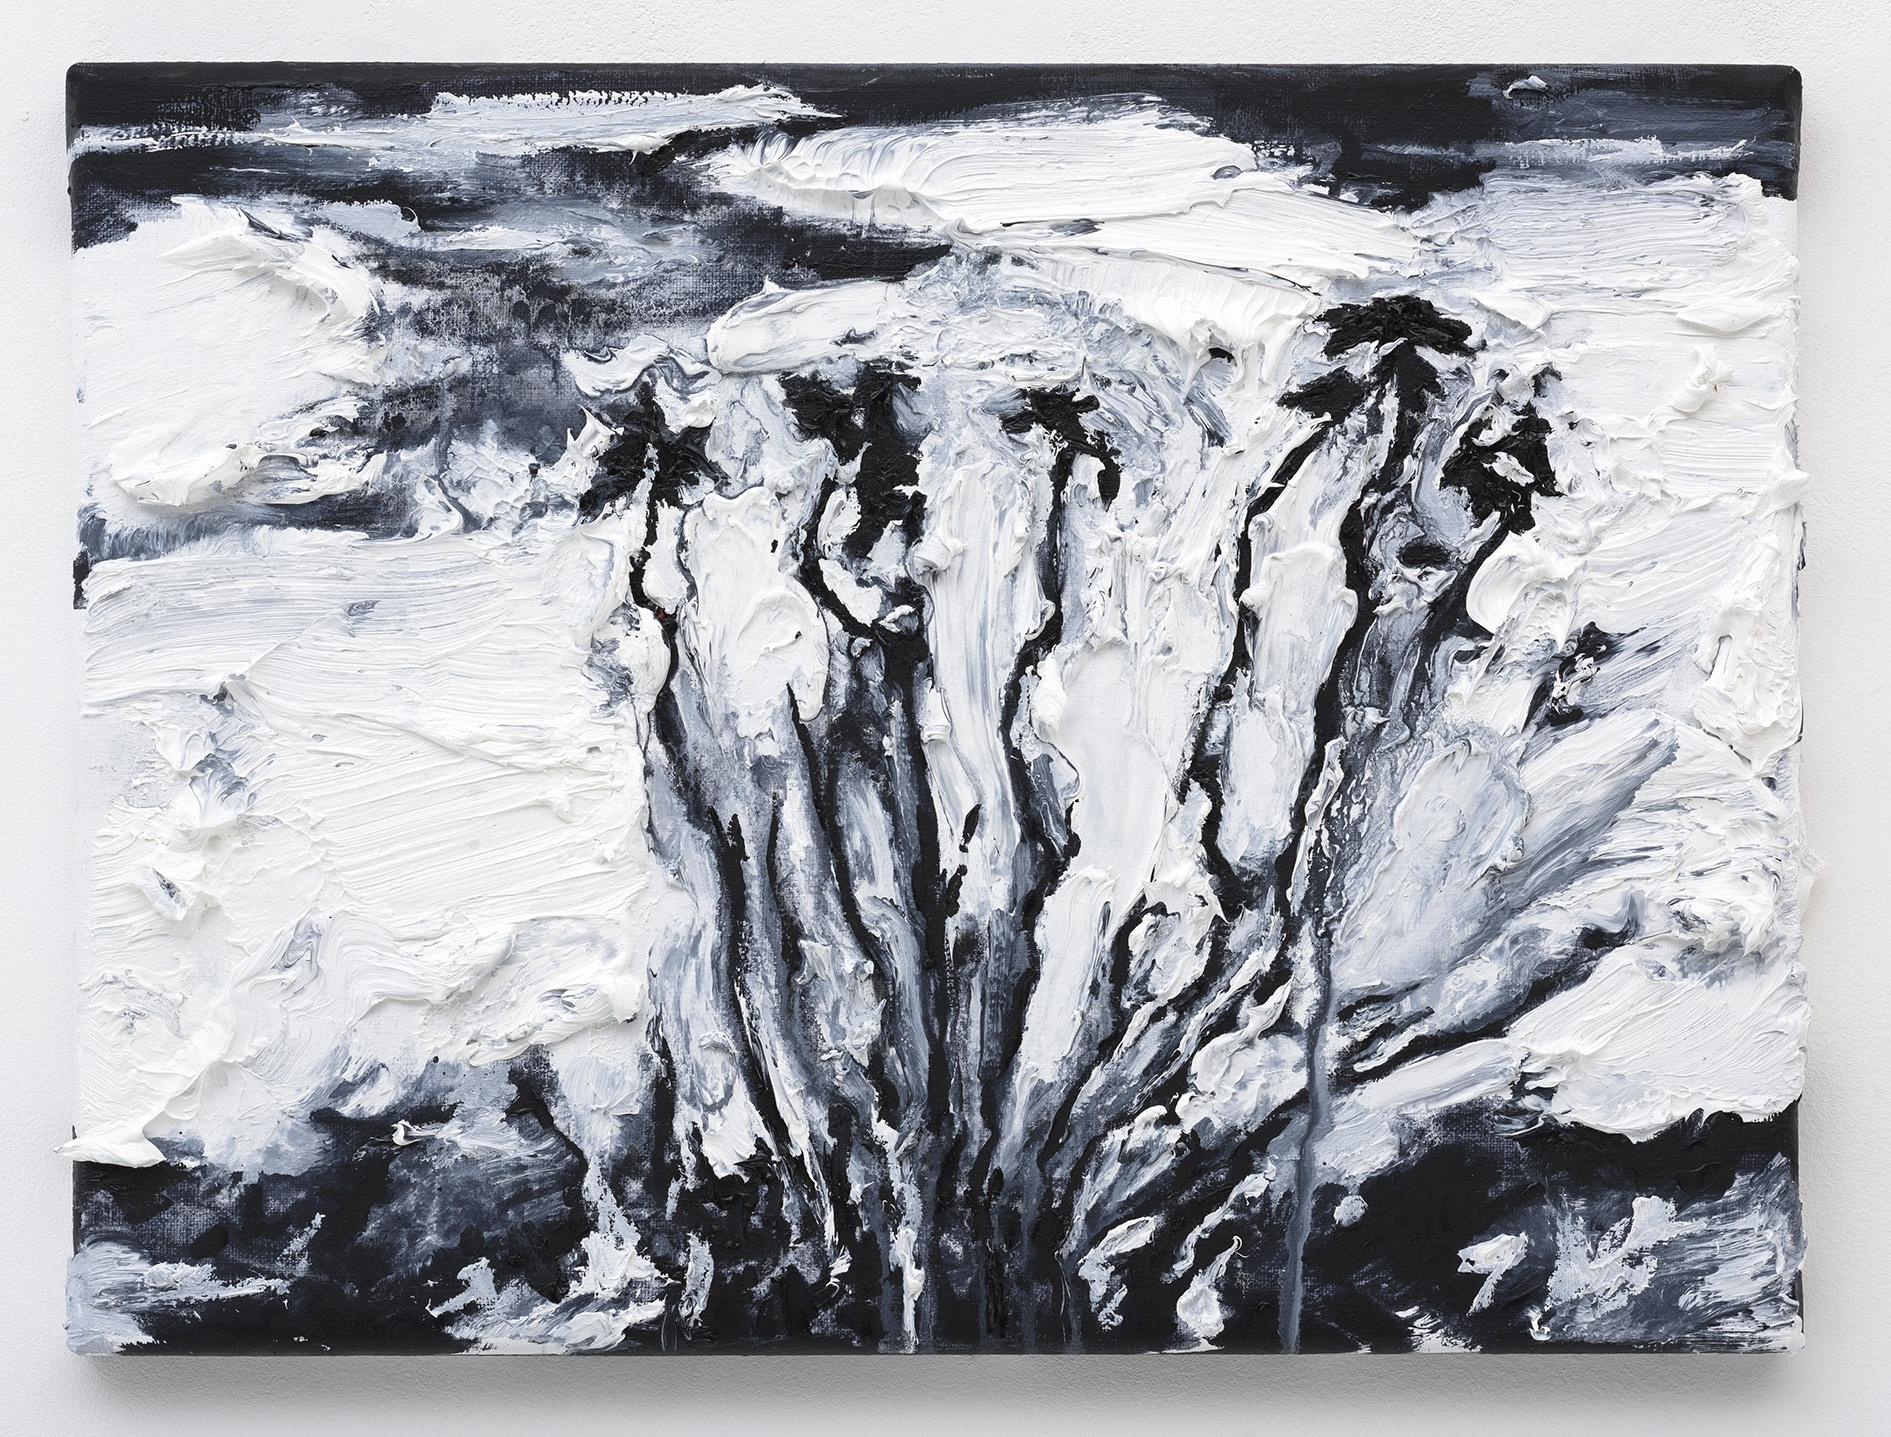 """Flor do Cardo"", 40 x 30 cm. oil on linen 2016"